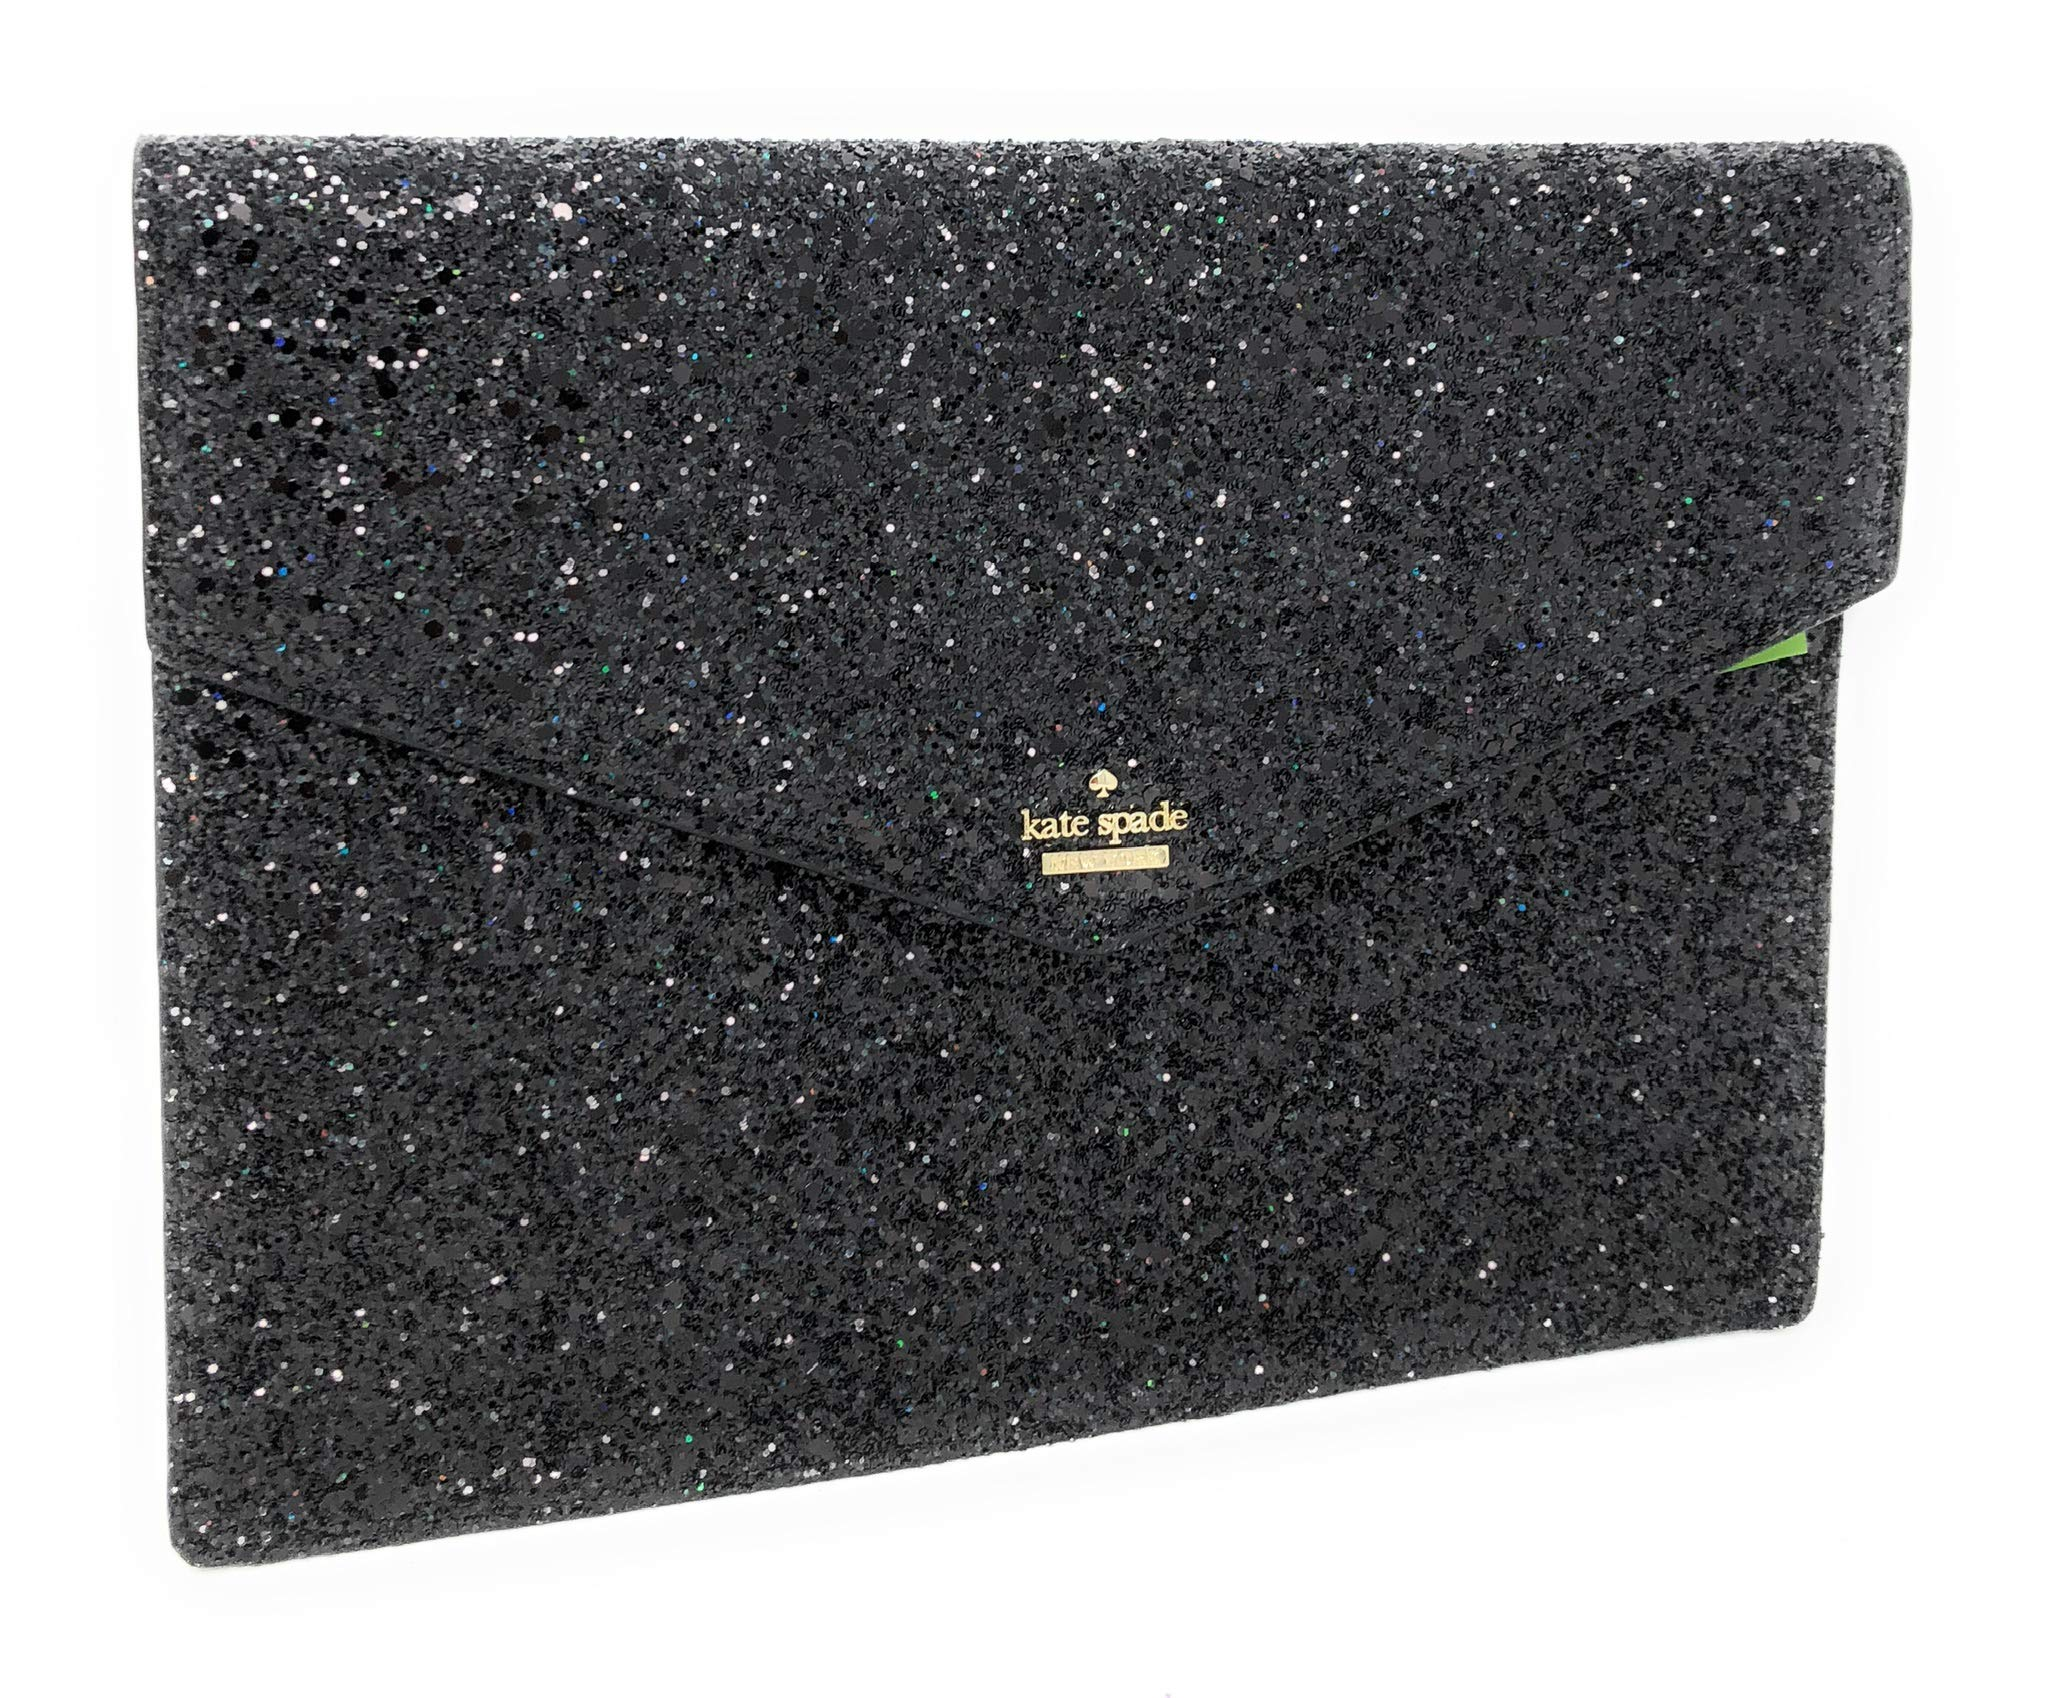 Kate Spade Mallo Laurel Way Glitter Clutch Evening Bag Black